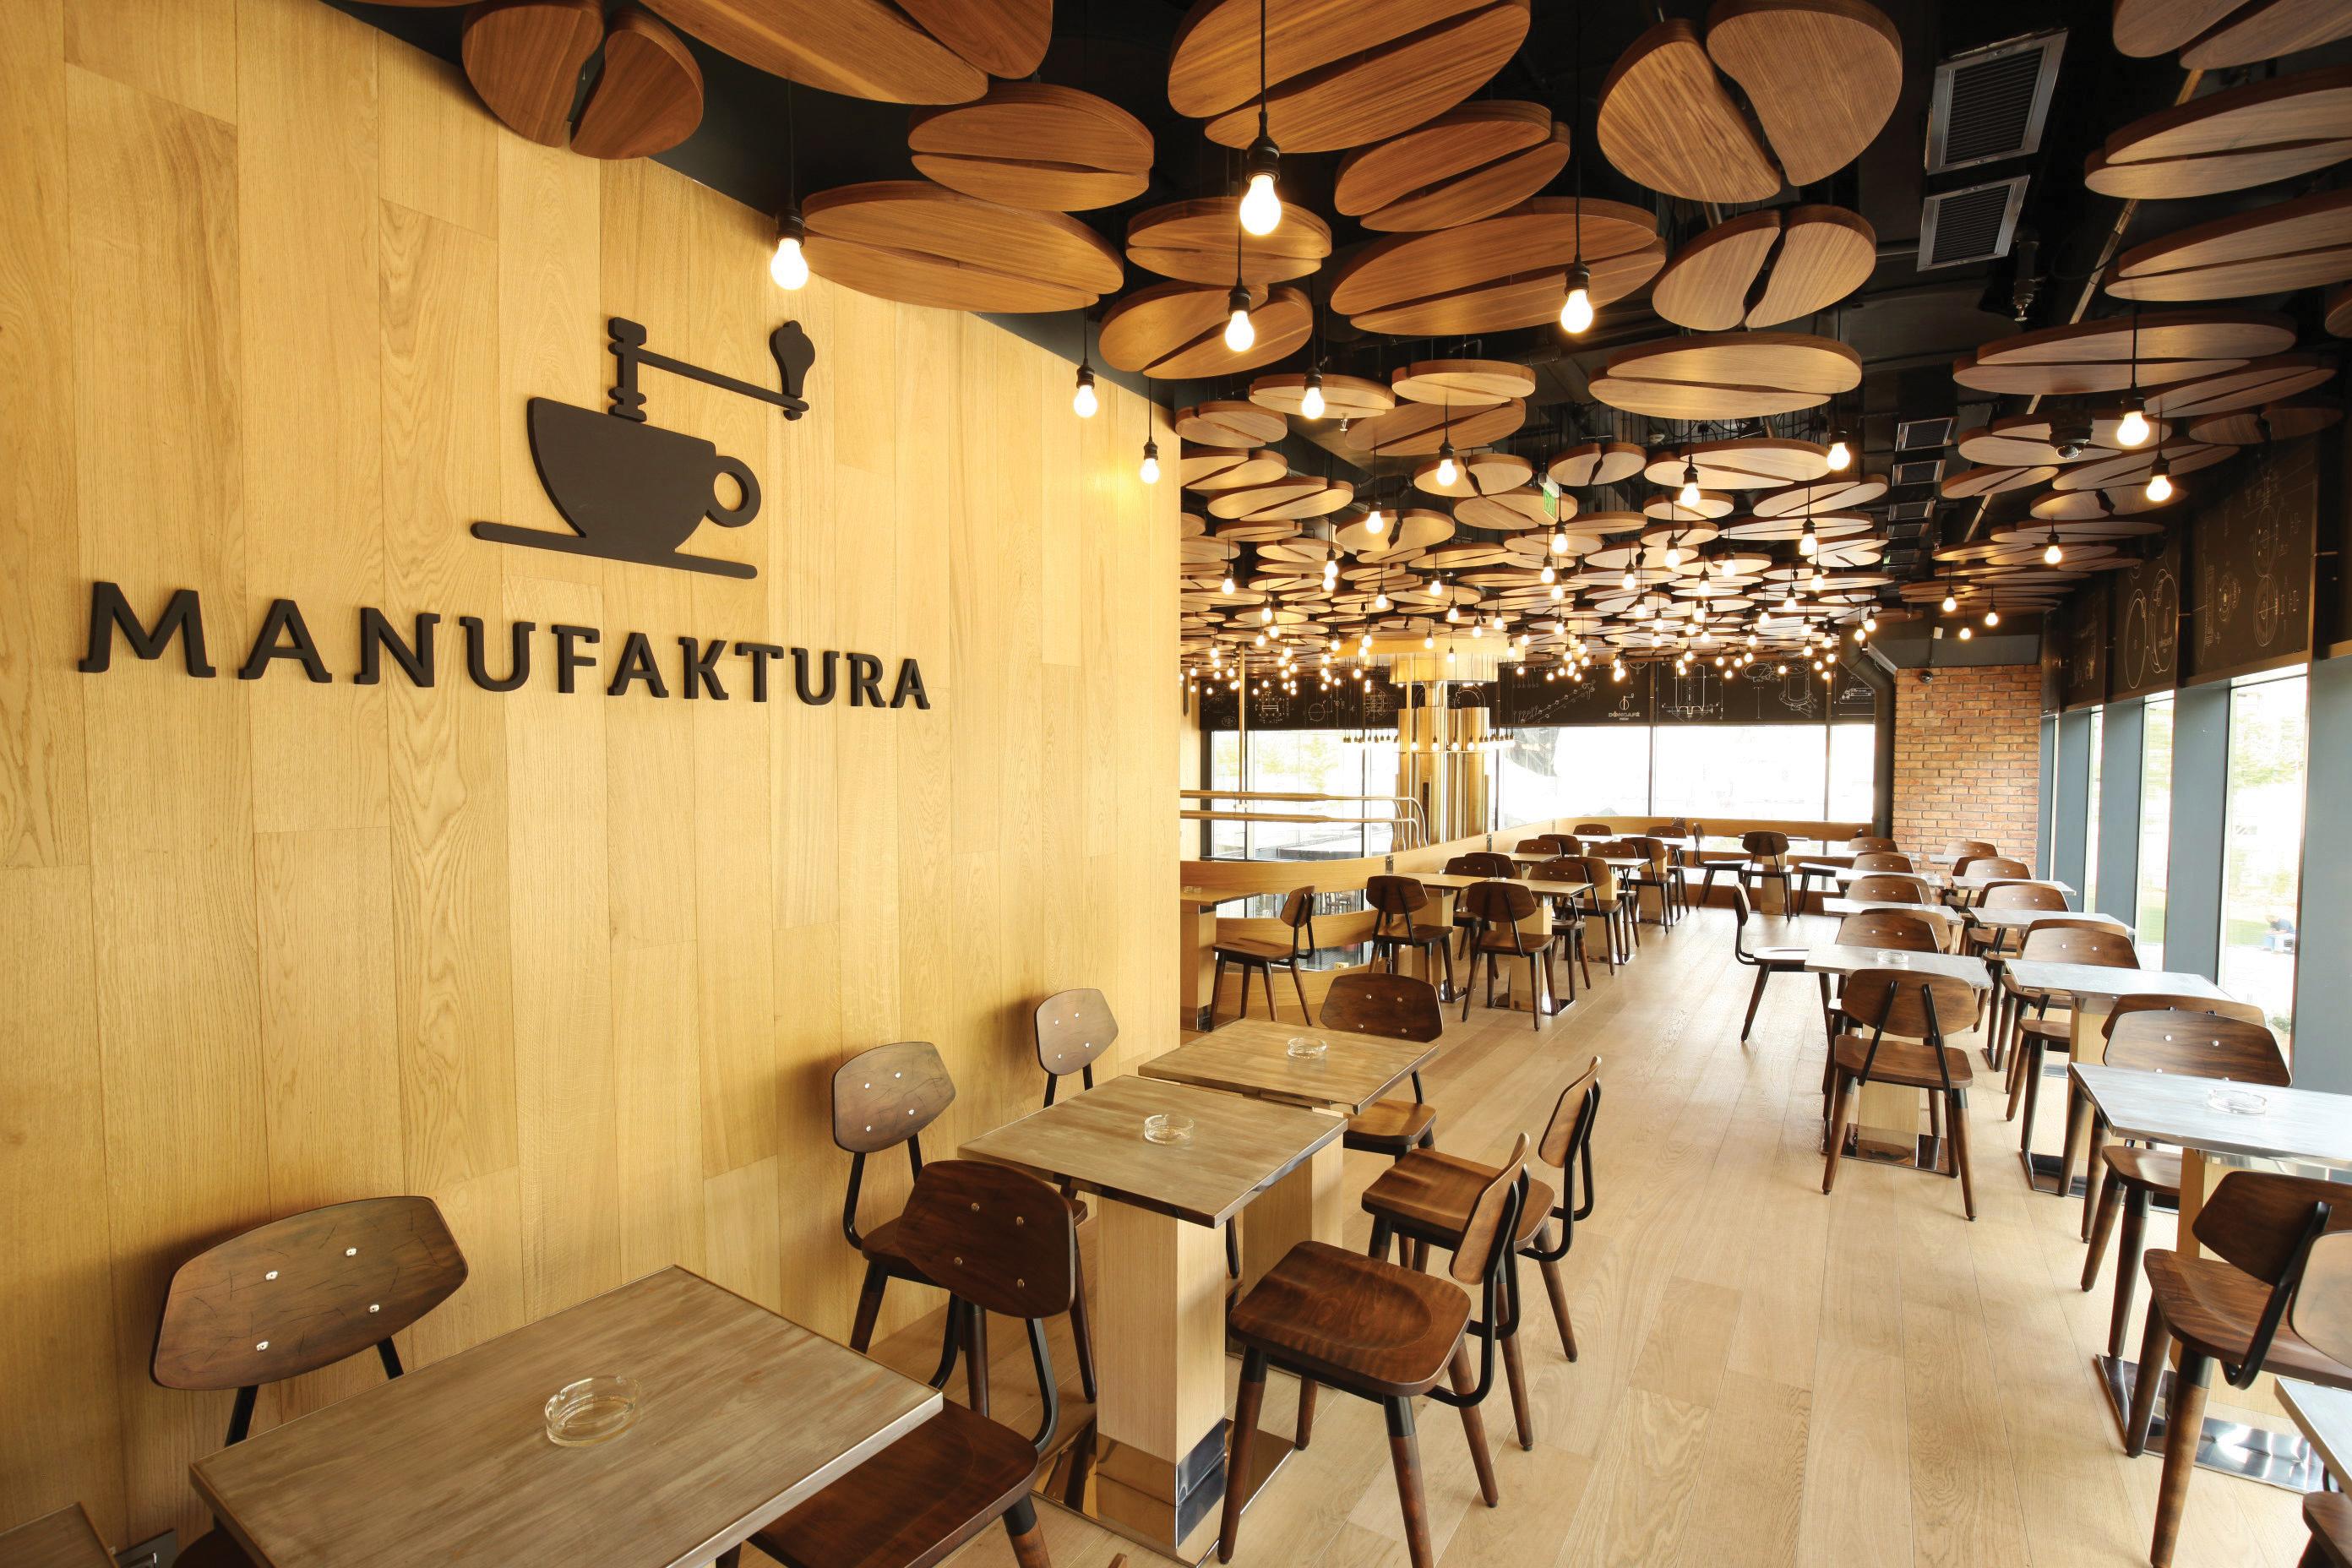 (P) Manufaktura The Coffee Shop Restaurant din Mega Mall